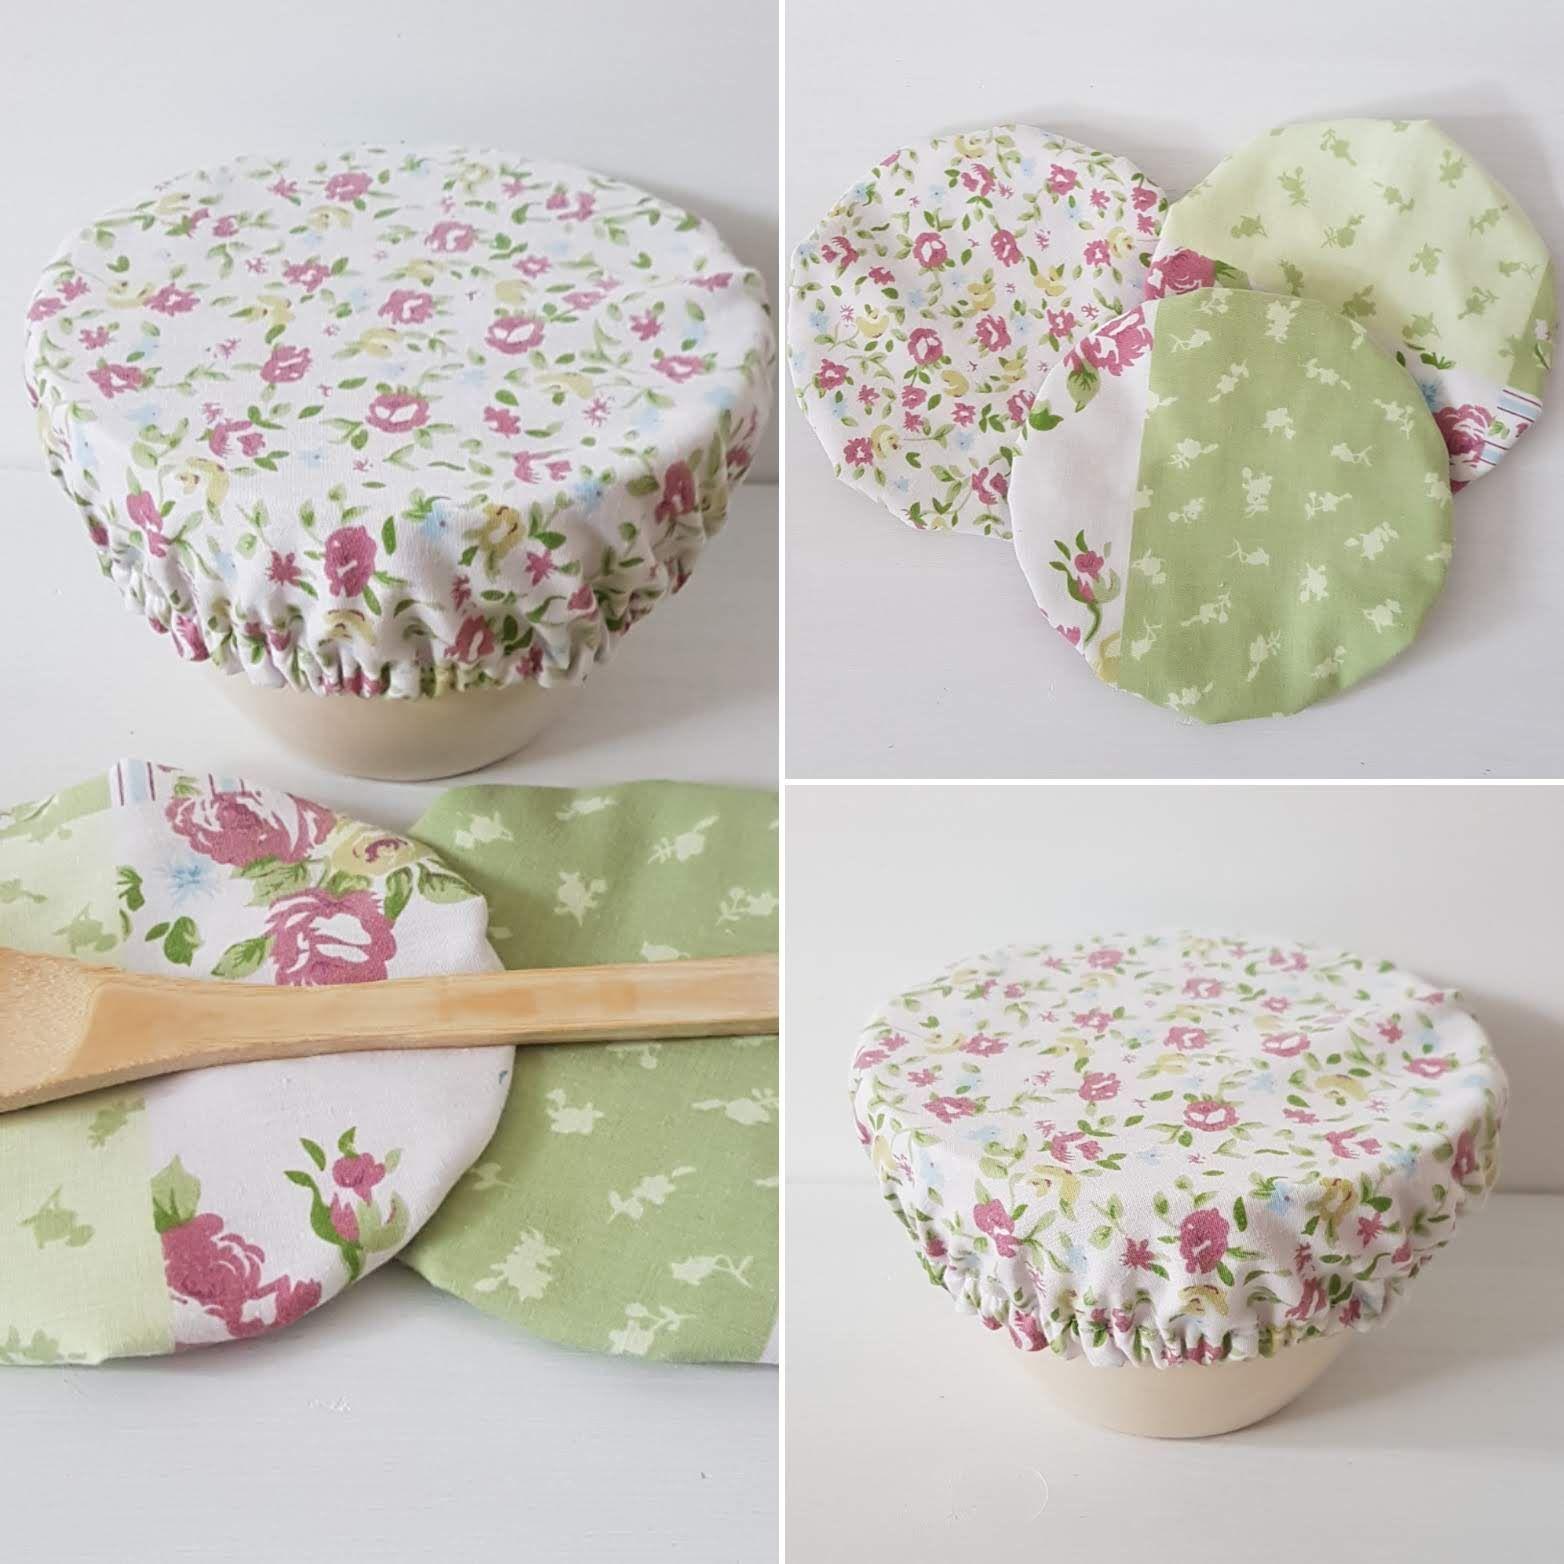 Mothers Day Reusable Gift Wrap Zero Waste Plastic-Free cotton wrap Heart Print